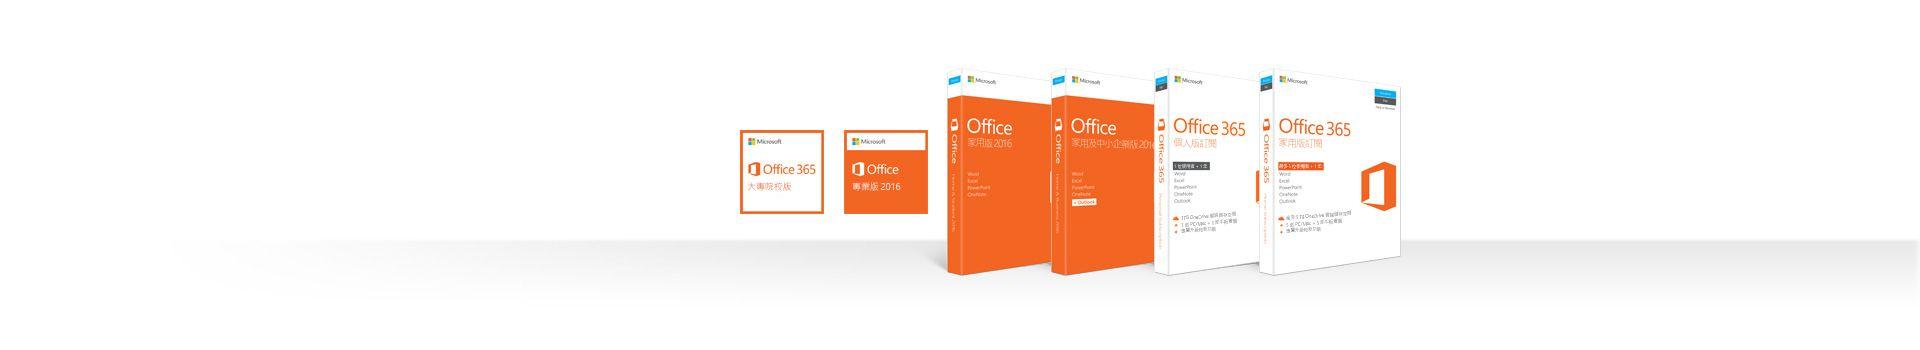 PC 版 Office 2016 和 PC 版 Office 365 產品的方格列